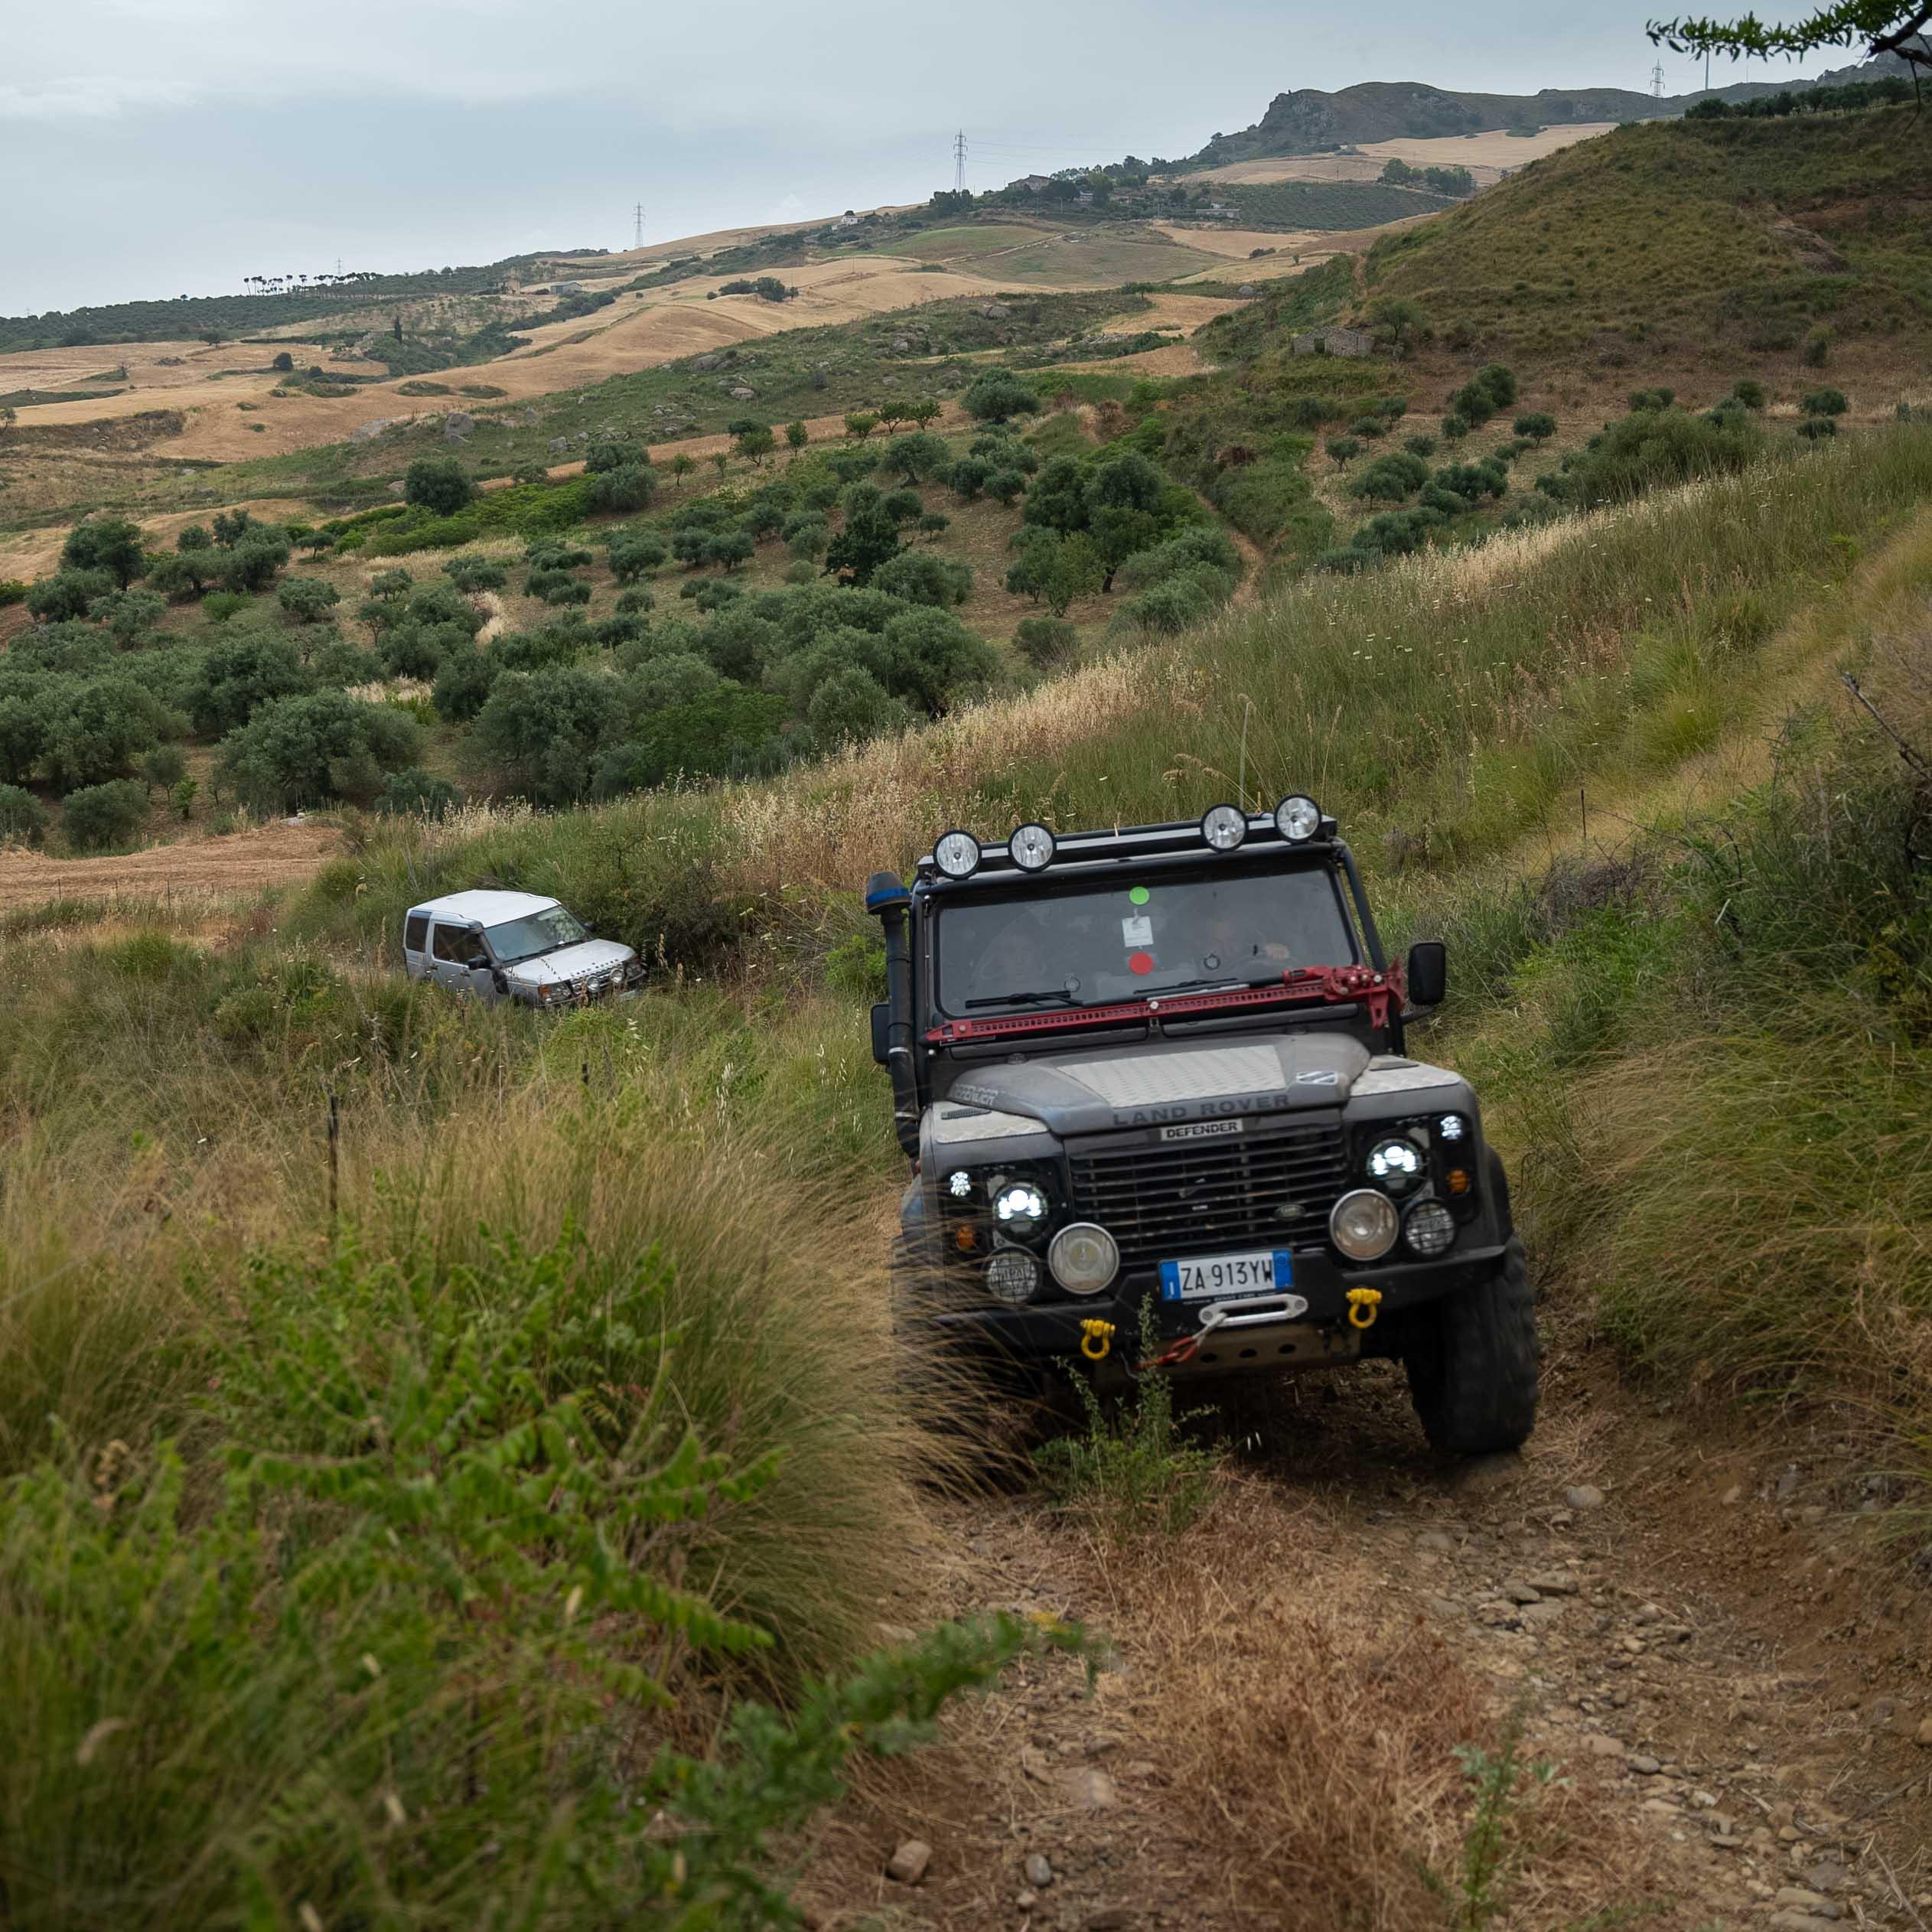 Land_Rover_Tour_Sicilia_2021_Land_Rover_Experience_Italia_-33